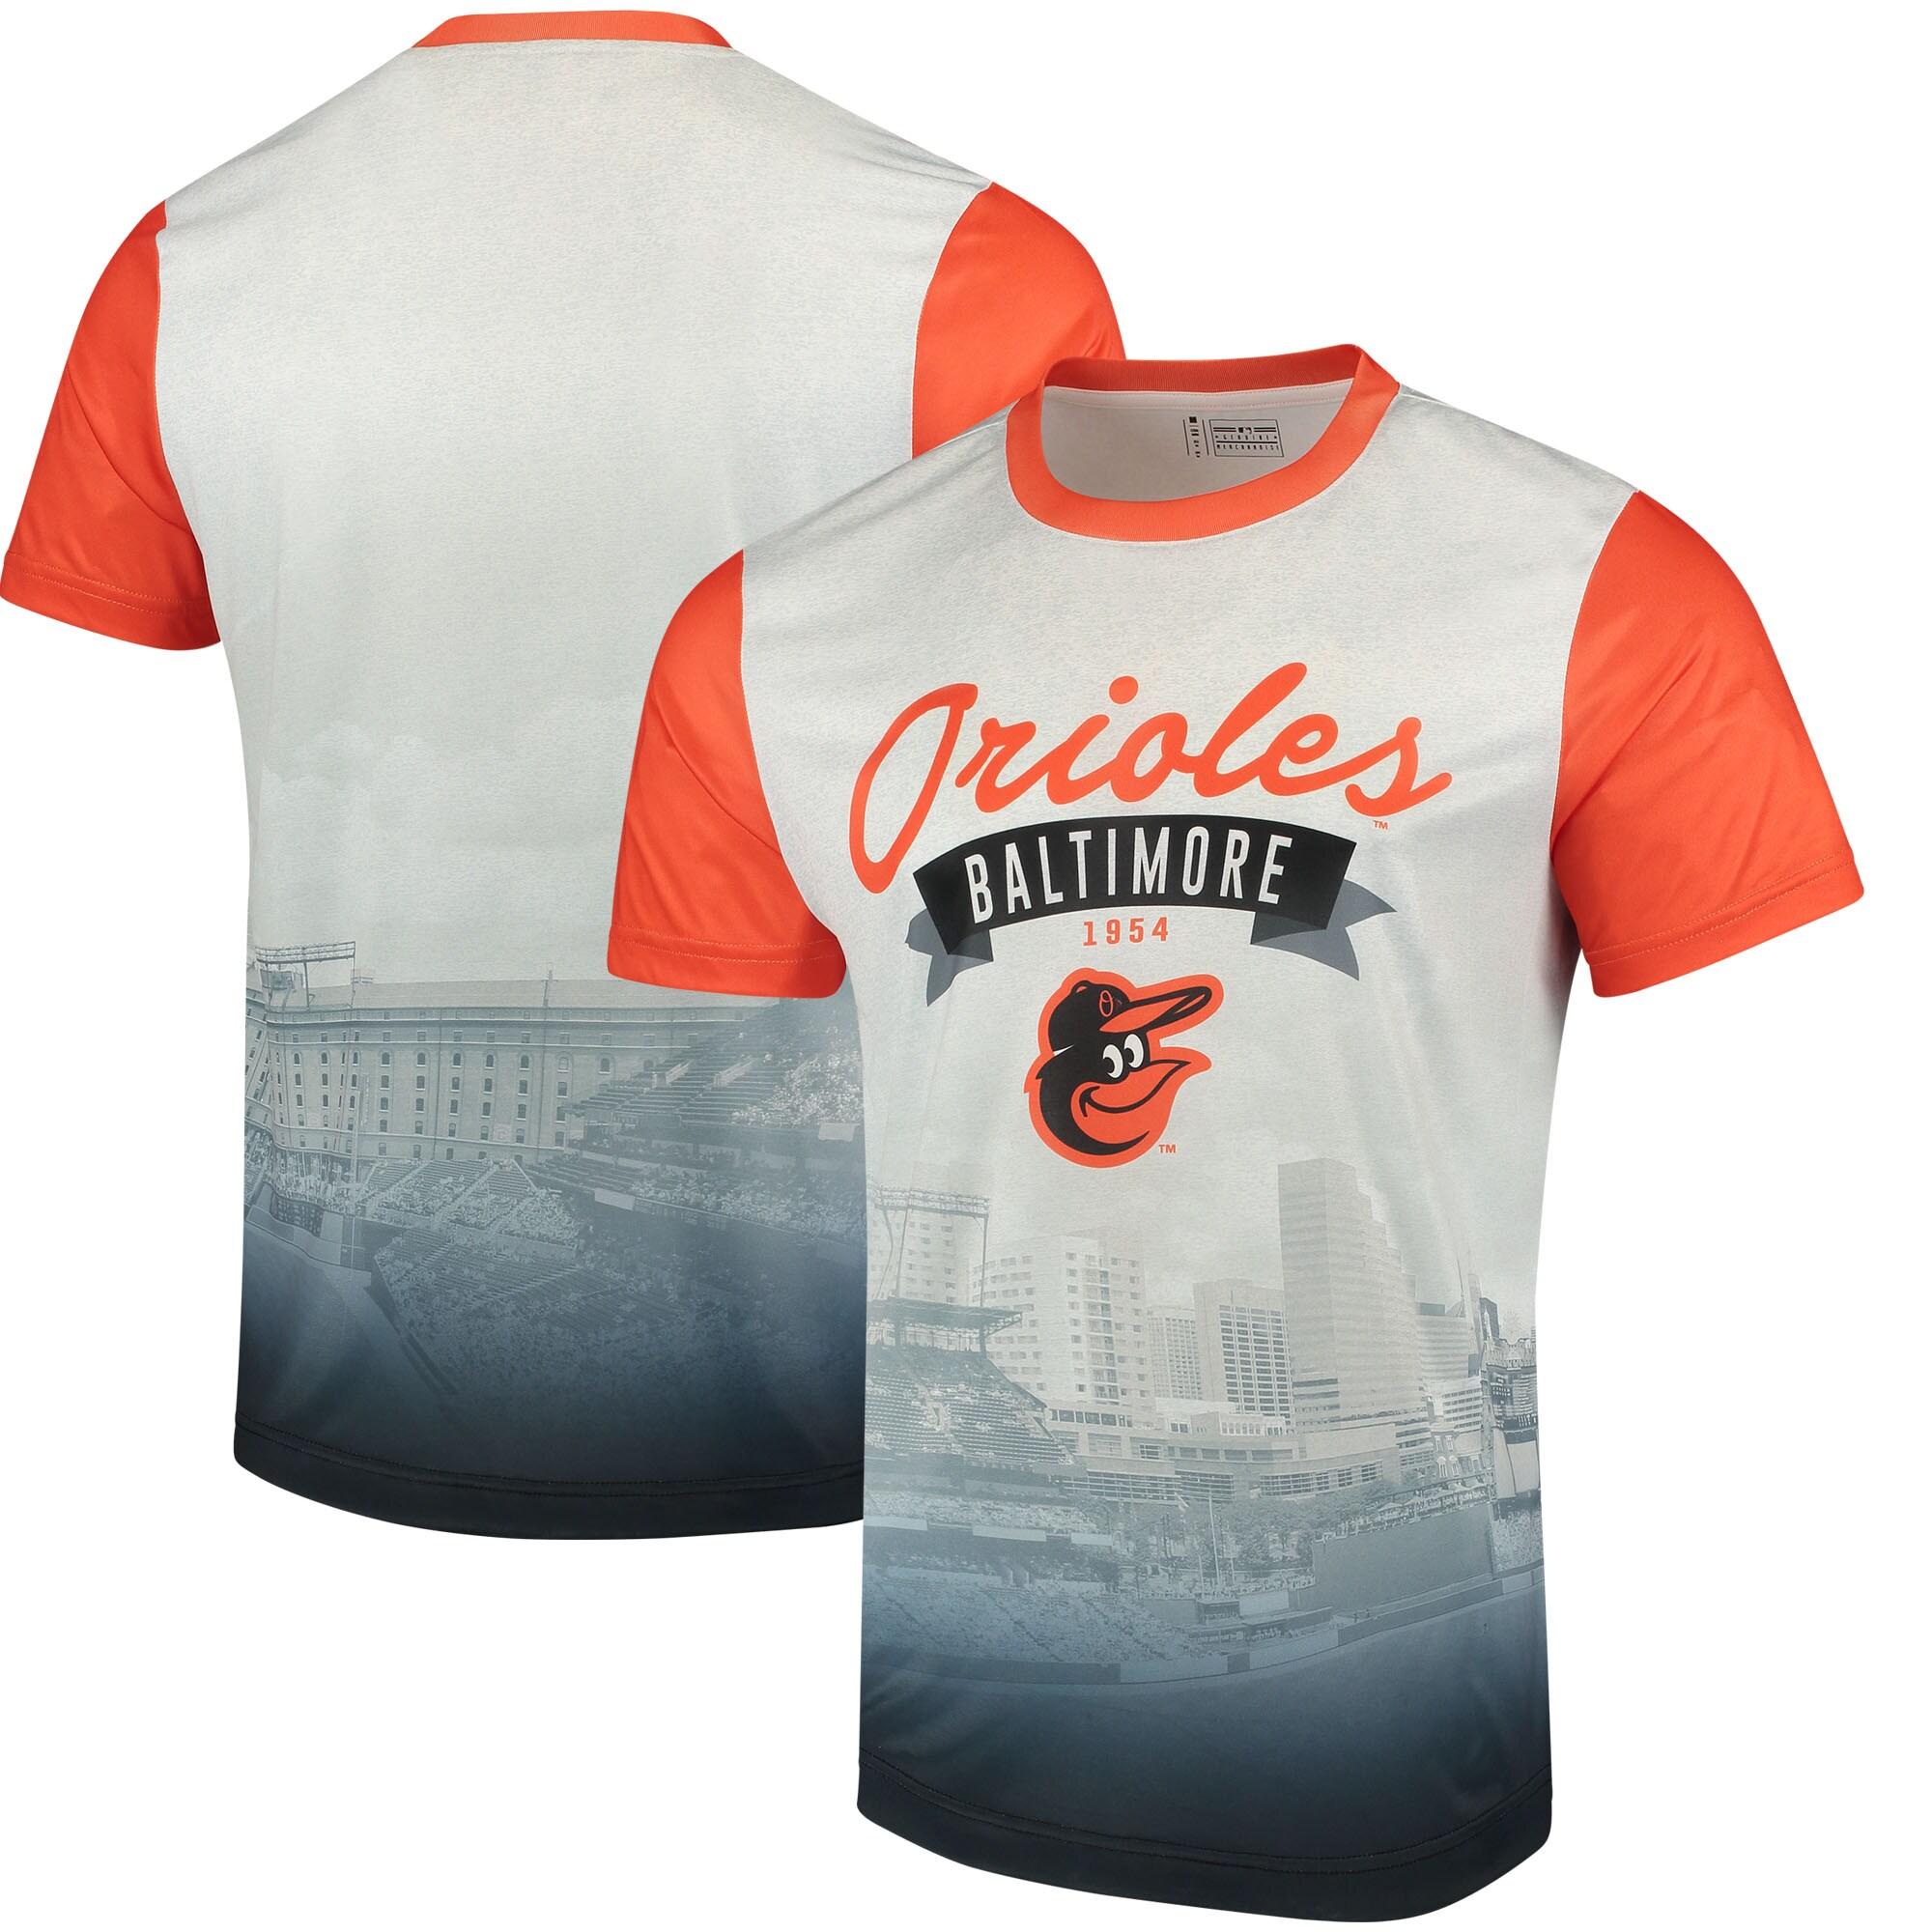 Baltimore Orioles Outfield Photo T-Shirt - White/Orange